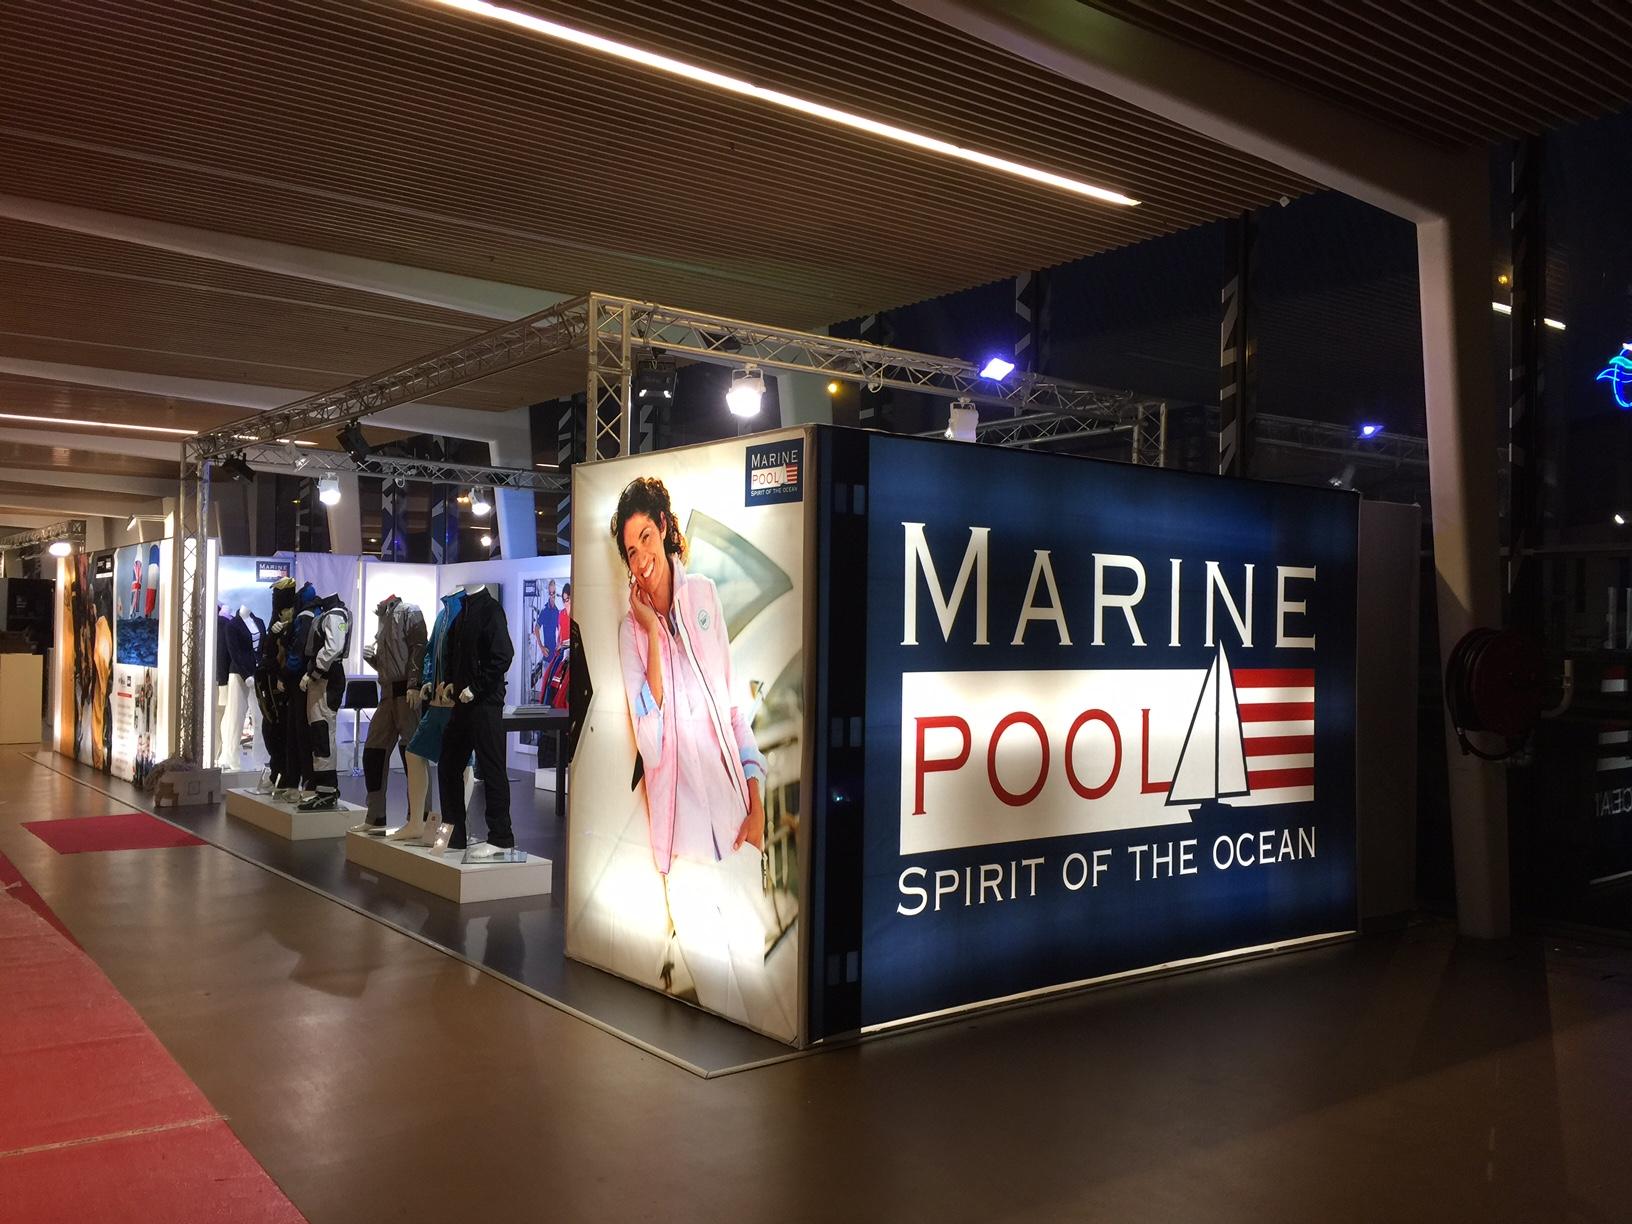 Marinepool at paris boat show!